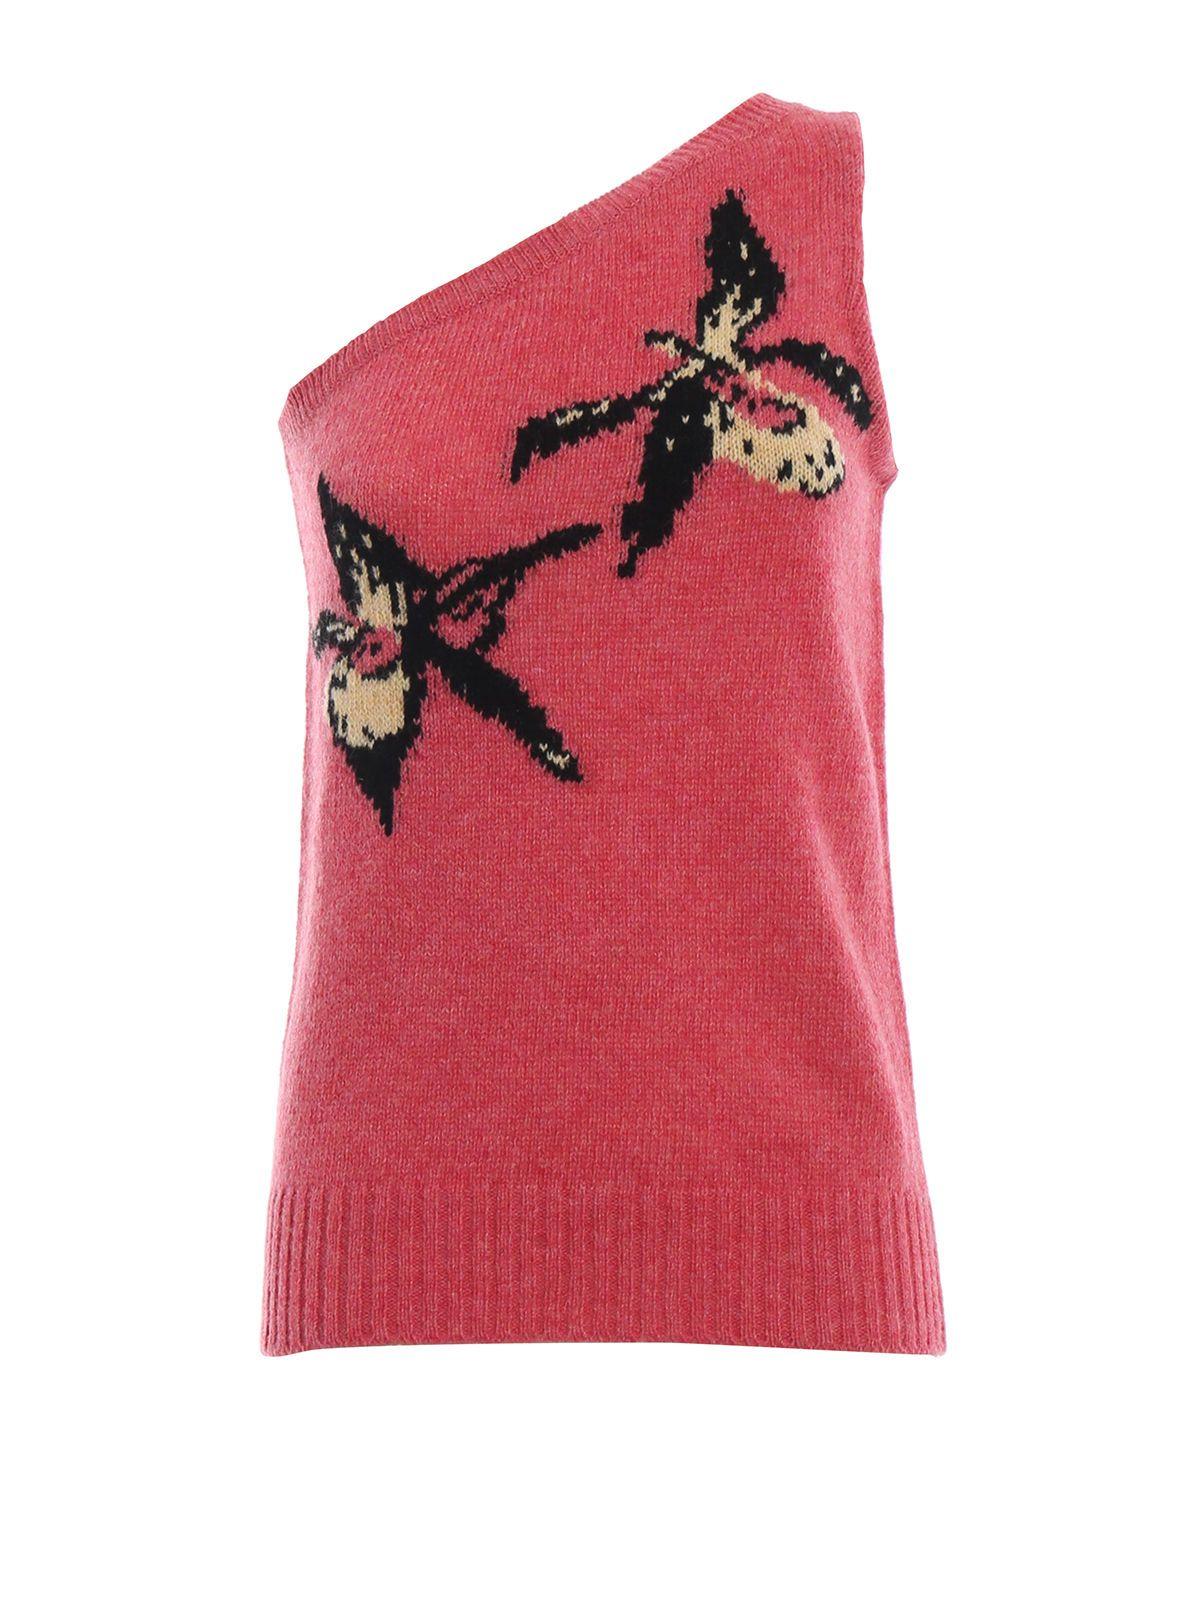 Shetland Orchid Sweater